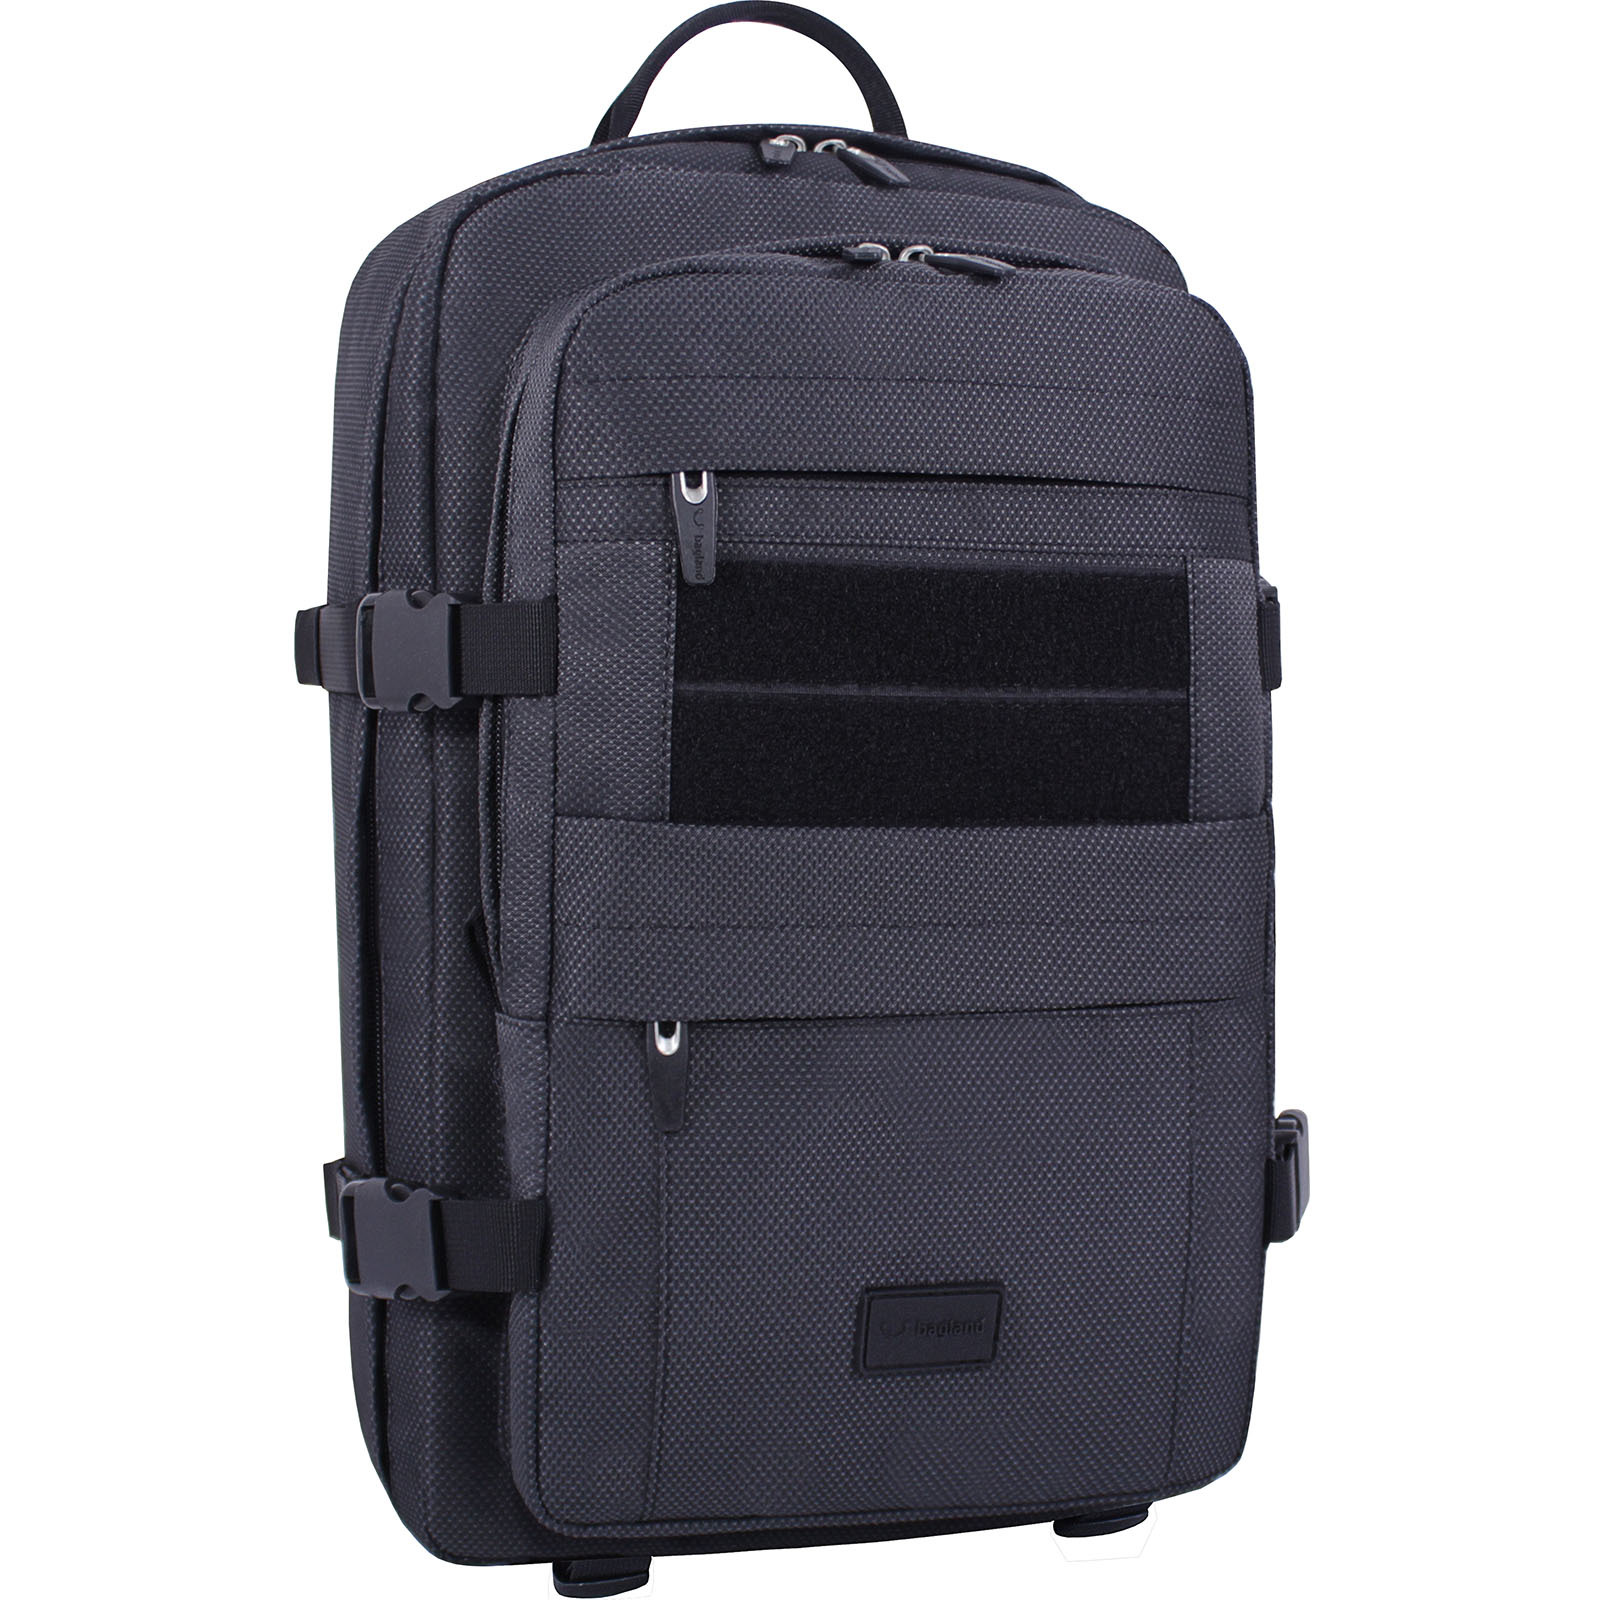 Рюкзаки для ноутбука Рюкзак для ноутбука Bagland Jasper 19 л. Чёрный (00155169) IMG_3183.JPG